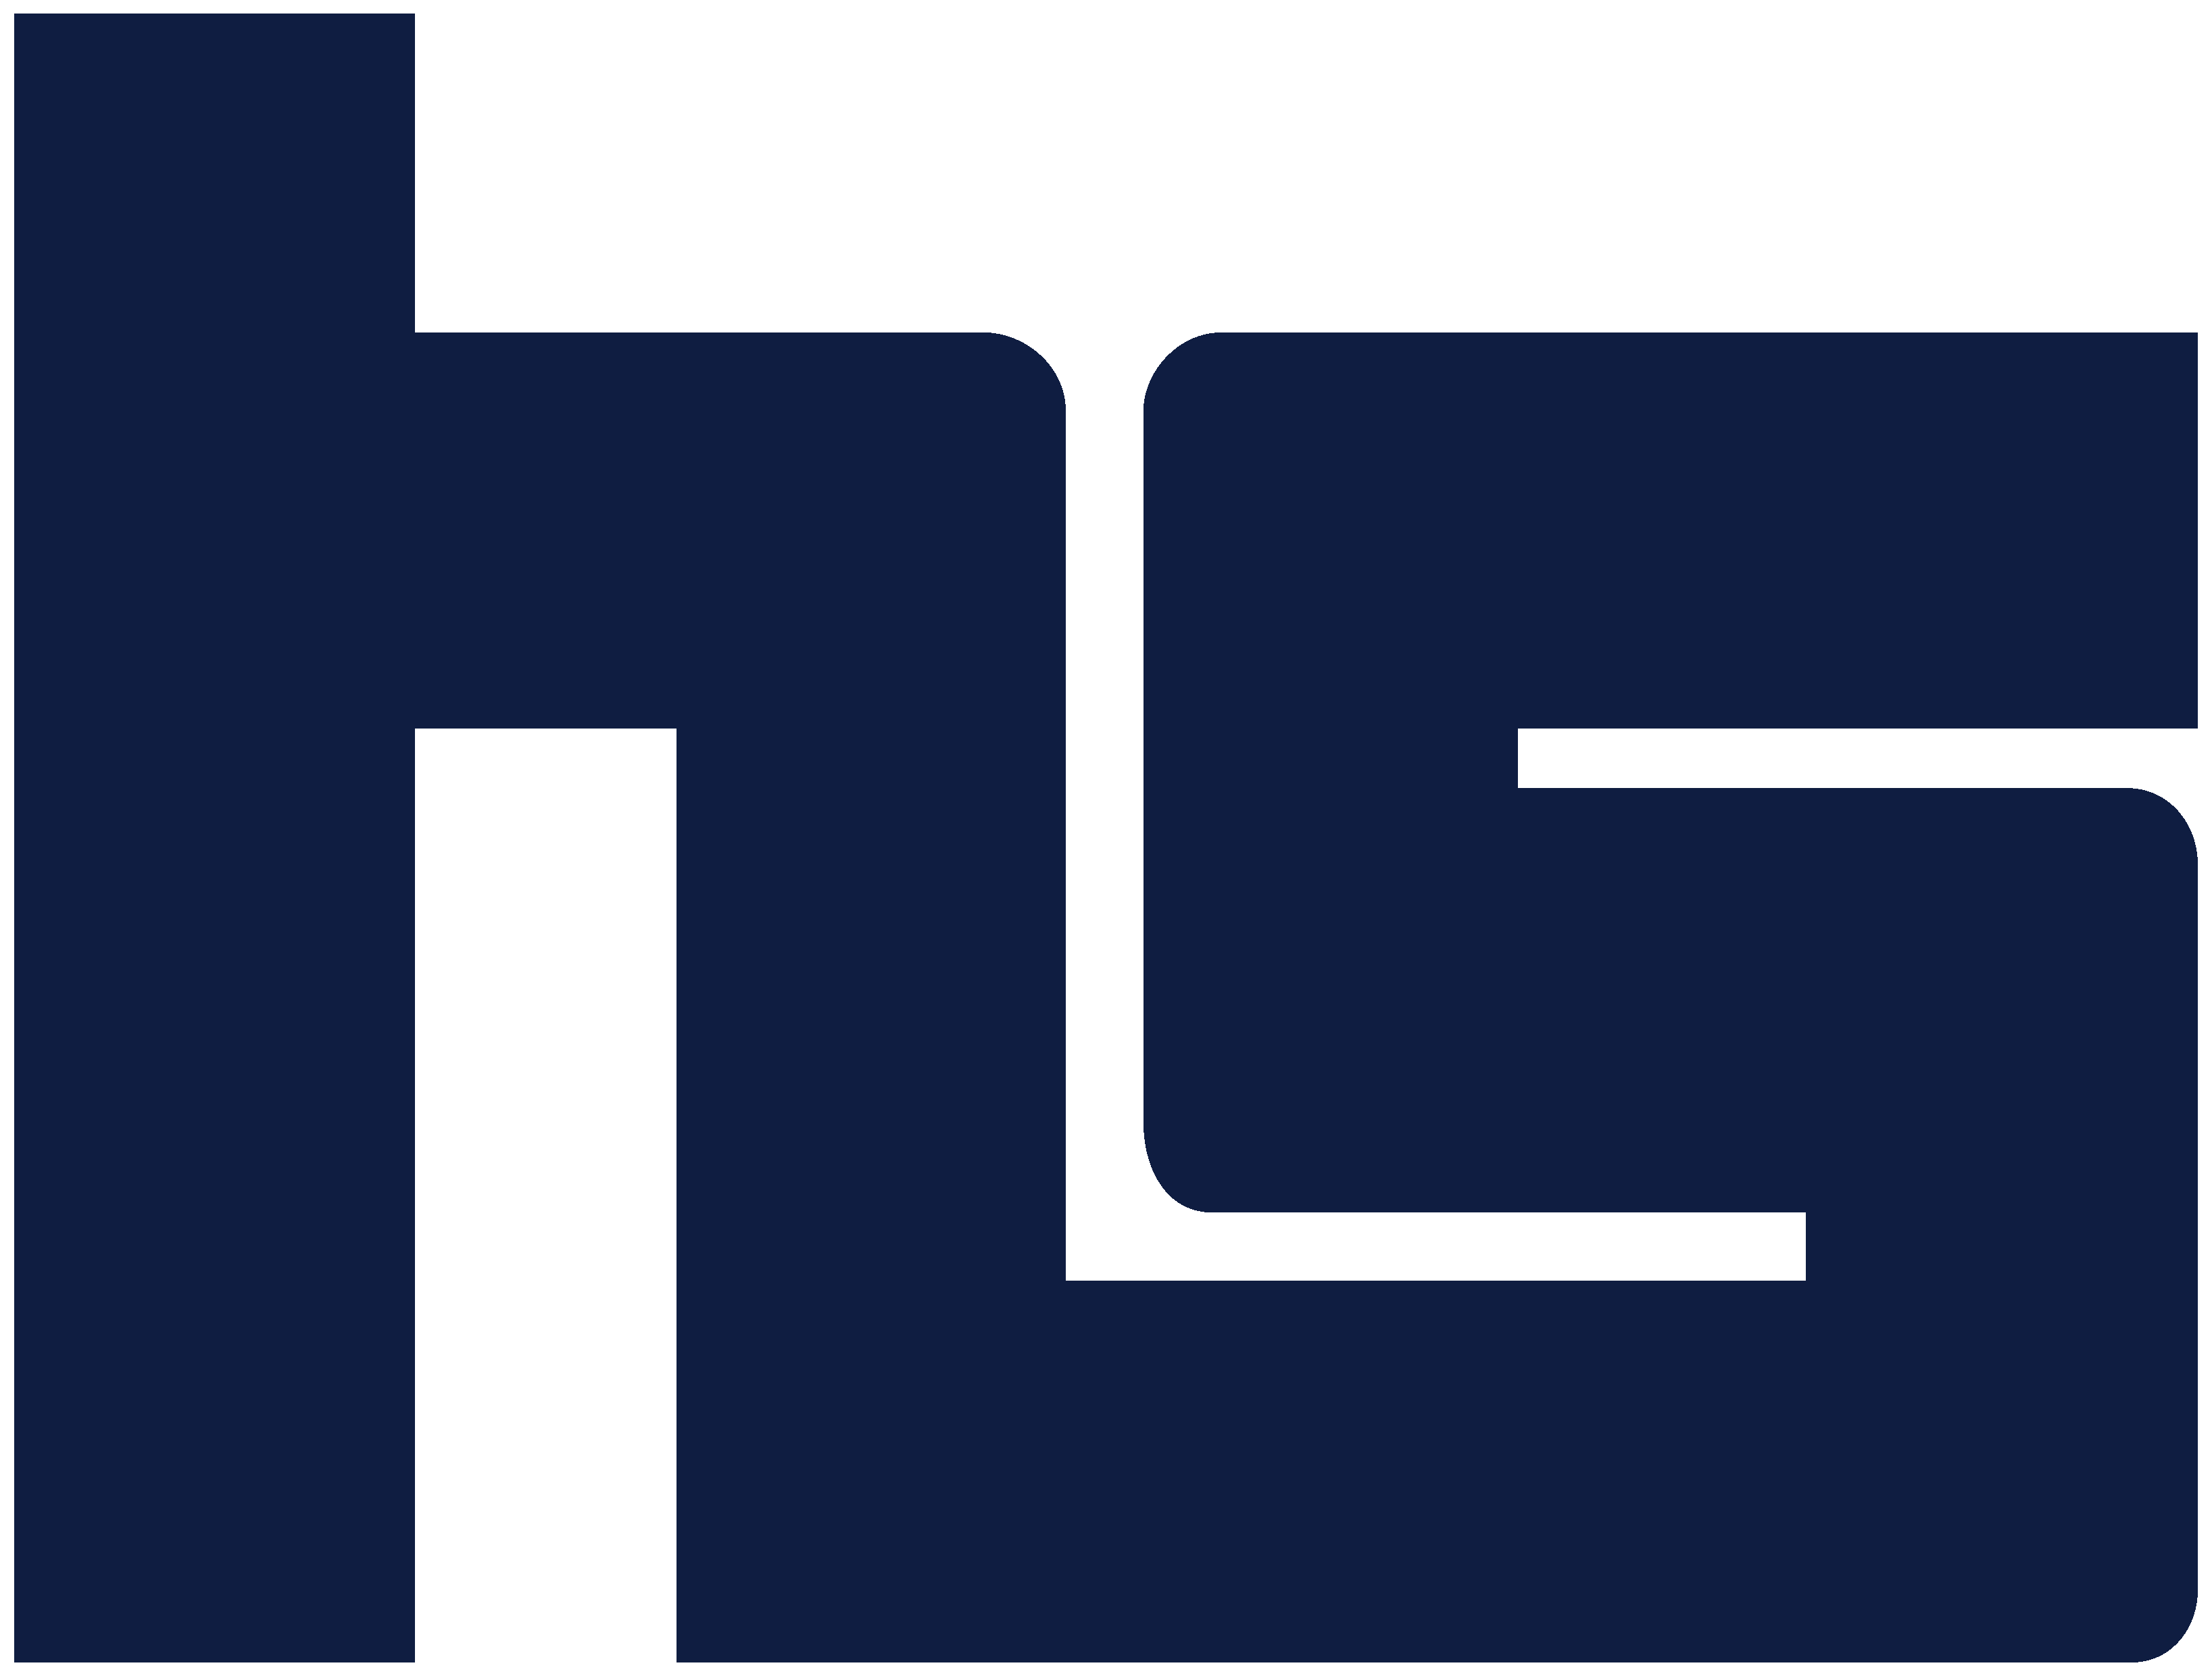 HILL & SMITH HOLDINGS PLC Logo